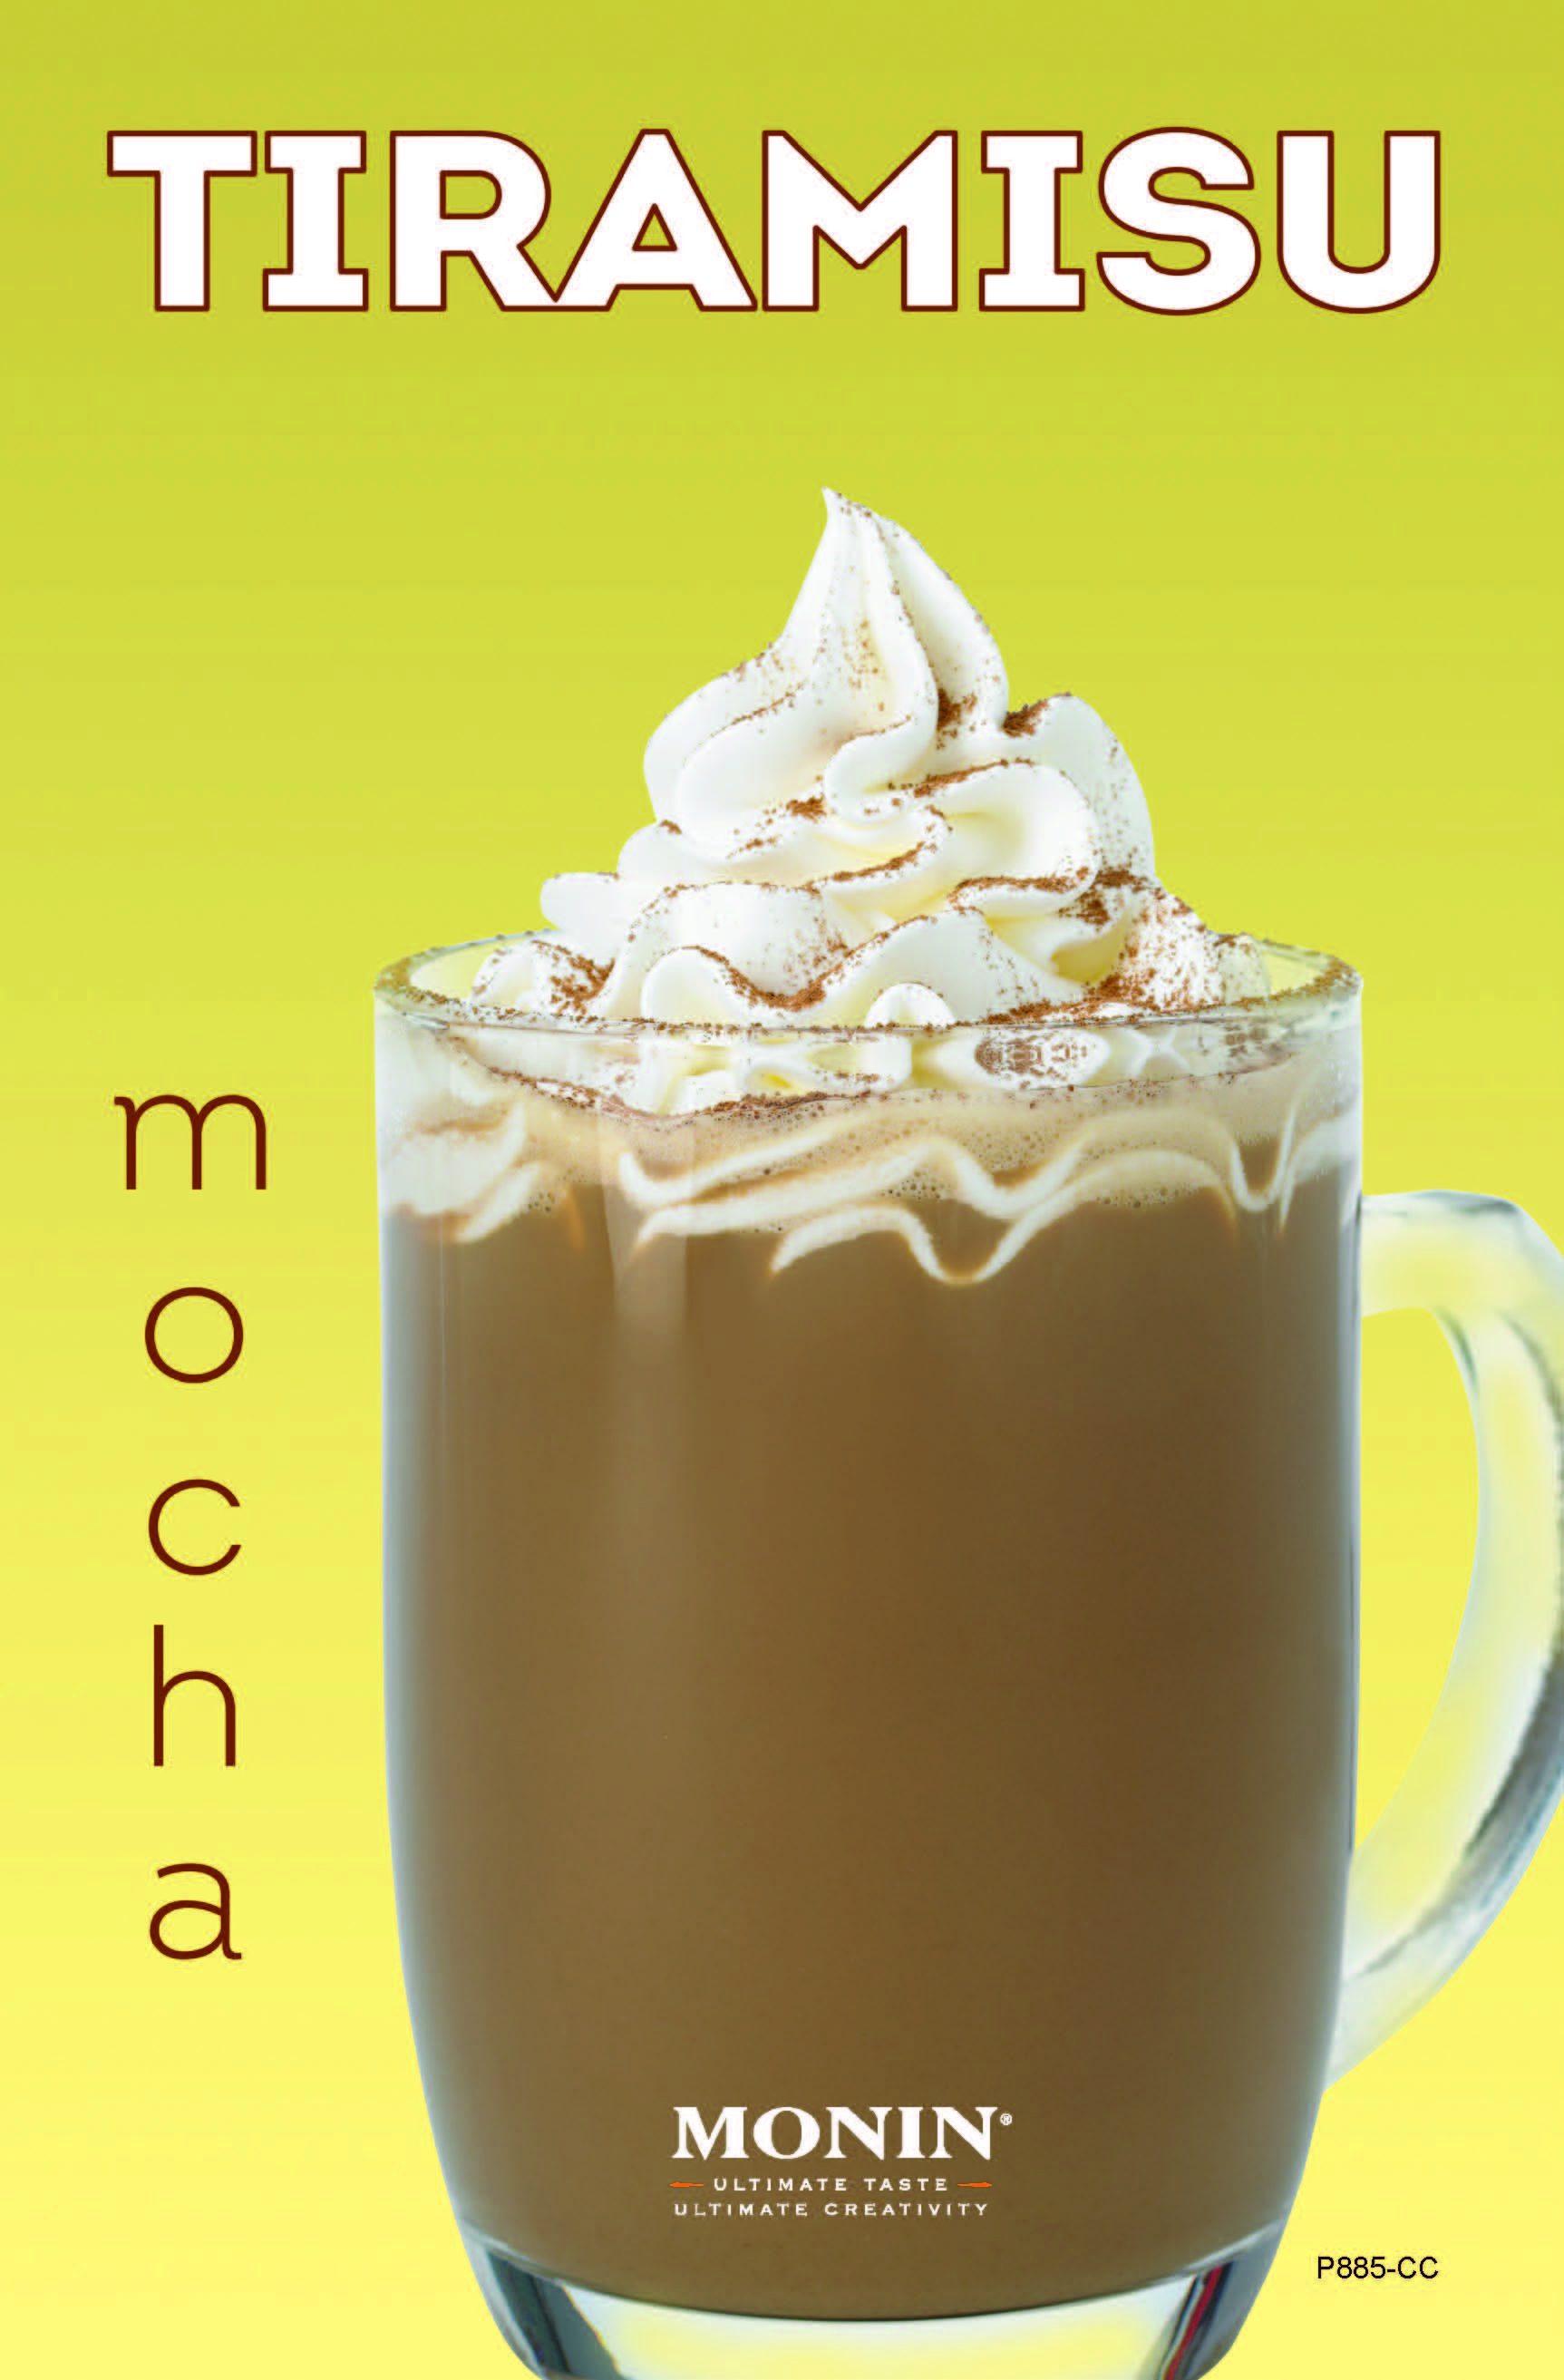 Make It With Monin Sugar Free Flavorings For A Low Calorie Treat See Recipe At Www Monin Com Mocha Recipe Sugar Free Recipes